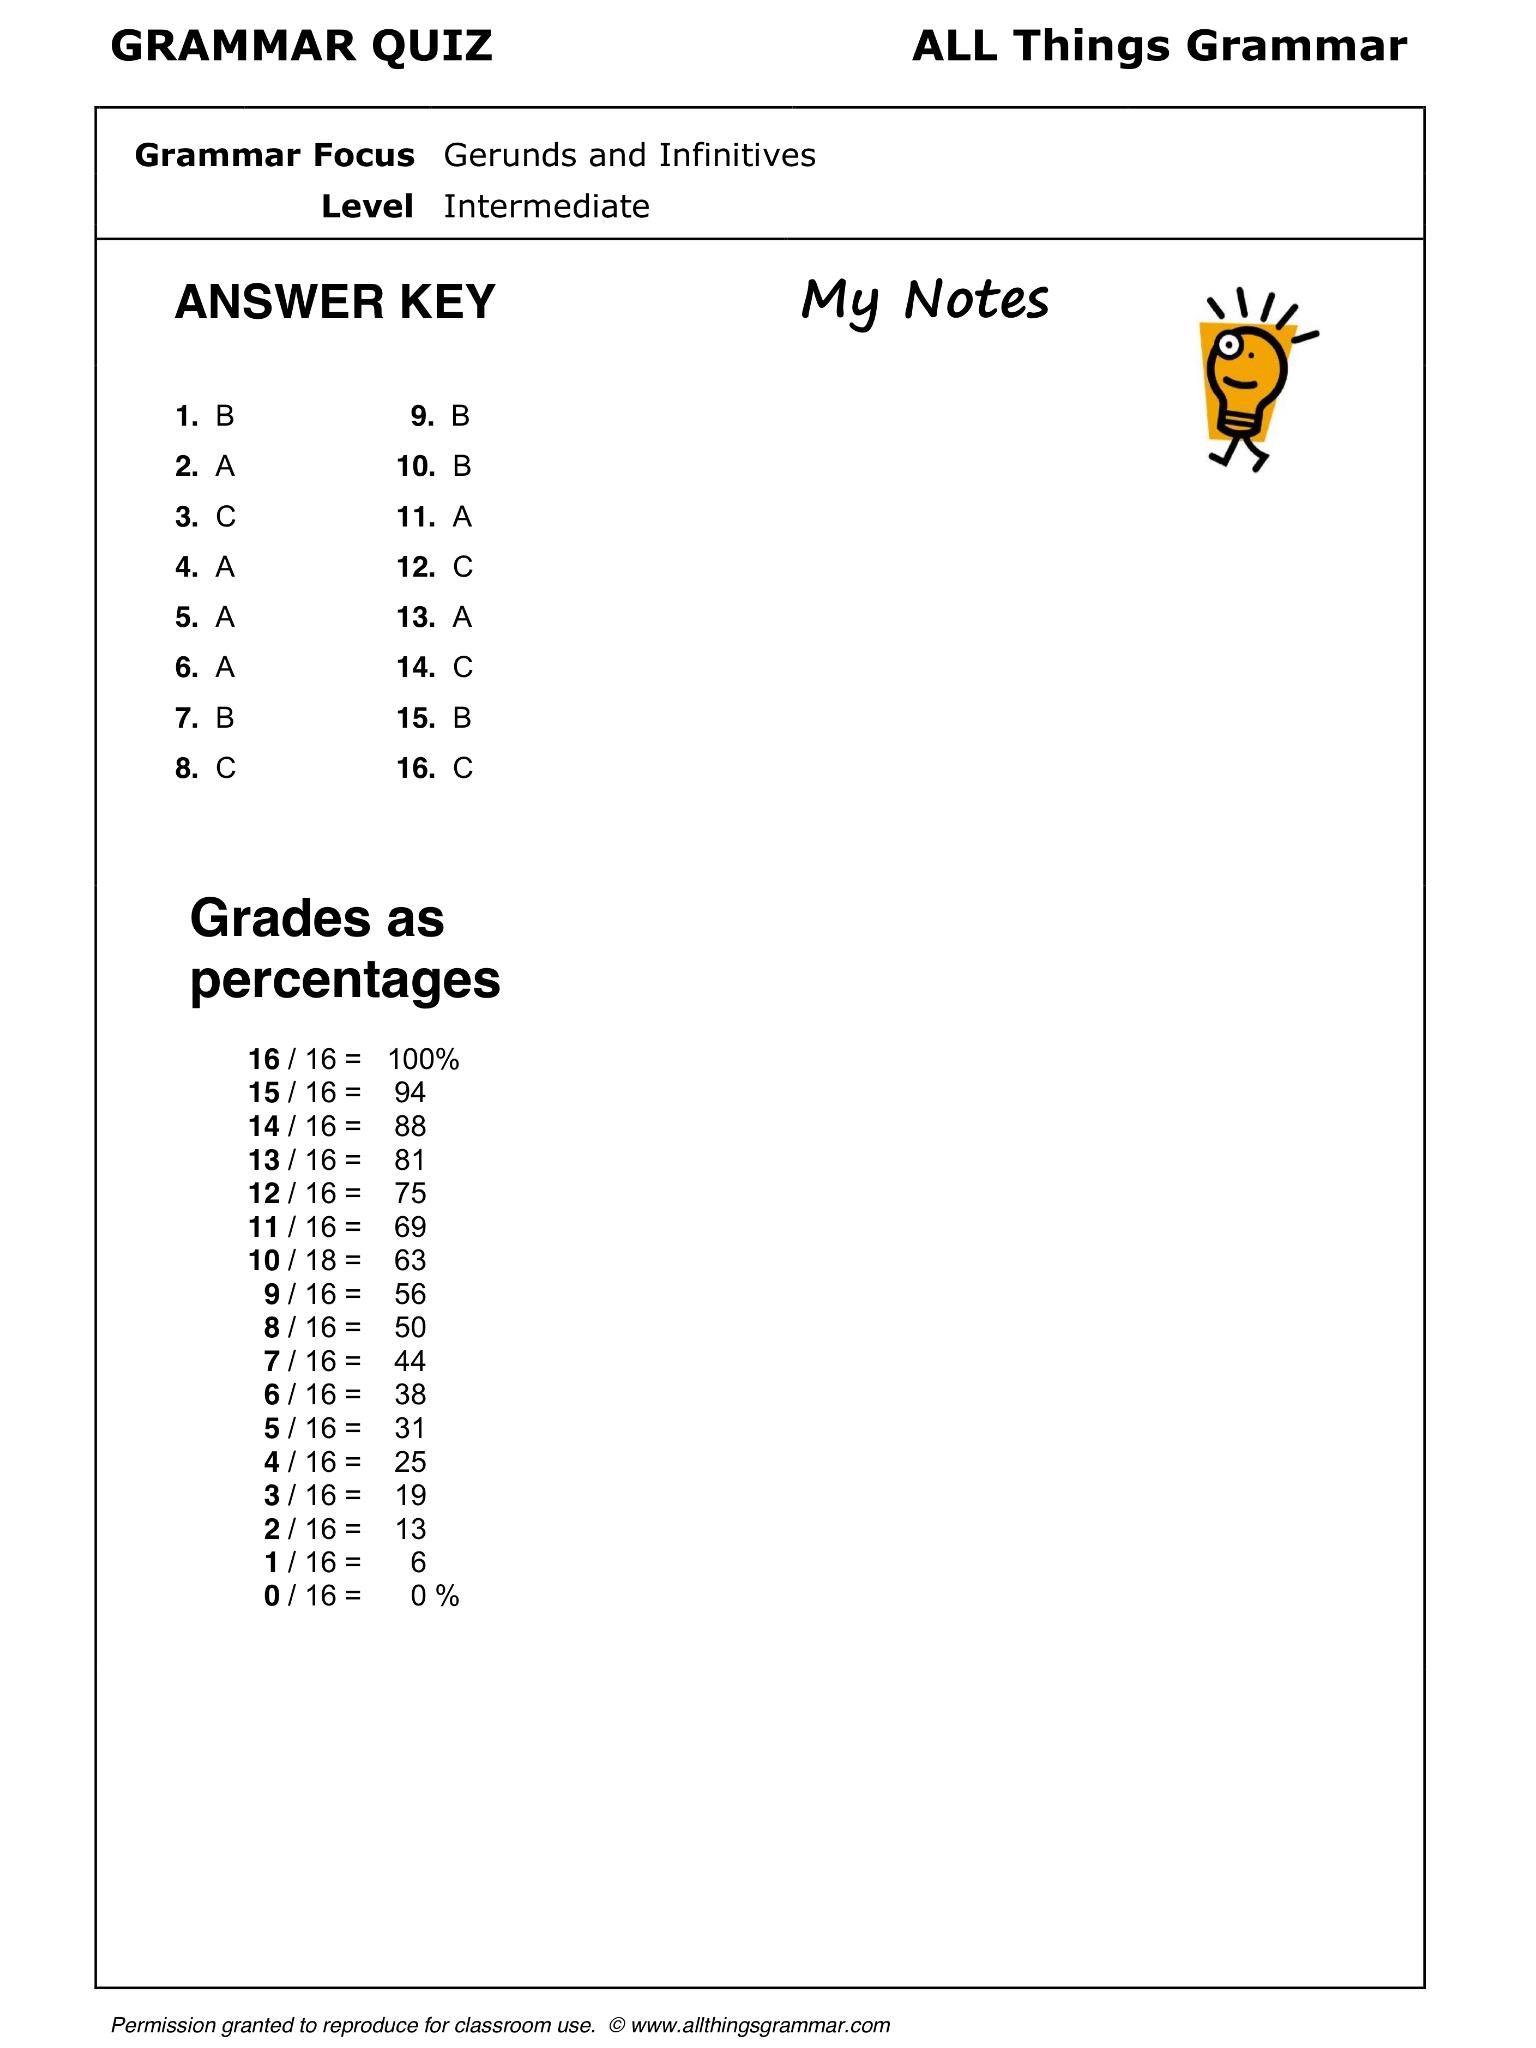 English Grammar Gerunds And Infinitives Www Allthingsgrammar Com Gerunds And Infinitives Html English Grammar Grammar Quiz Grammar Worksheets [ 2048 x 1536 Pixel ]